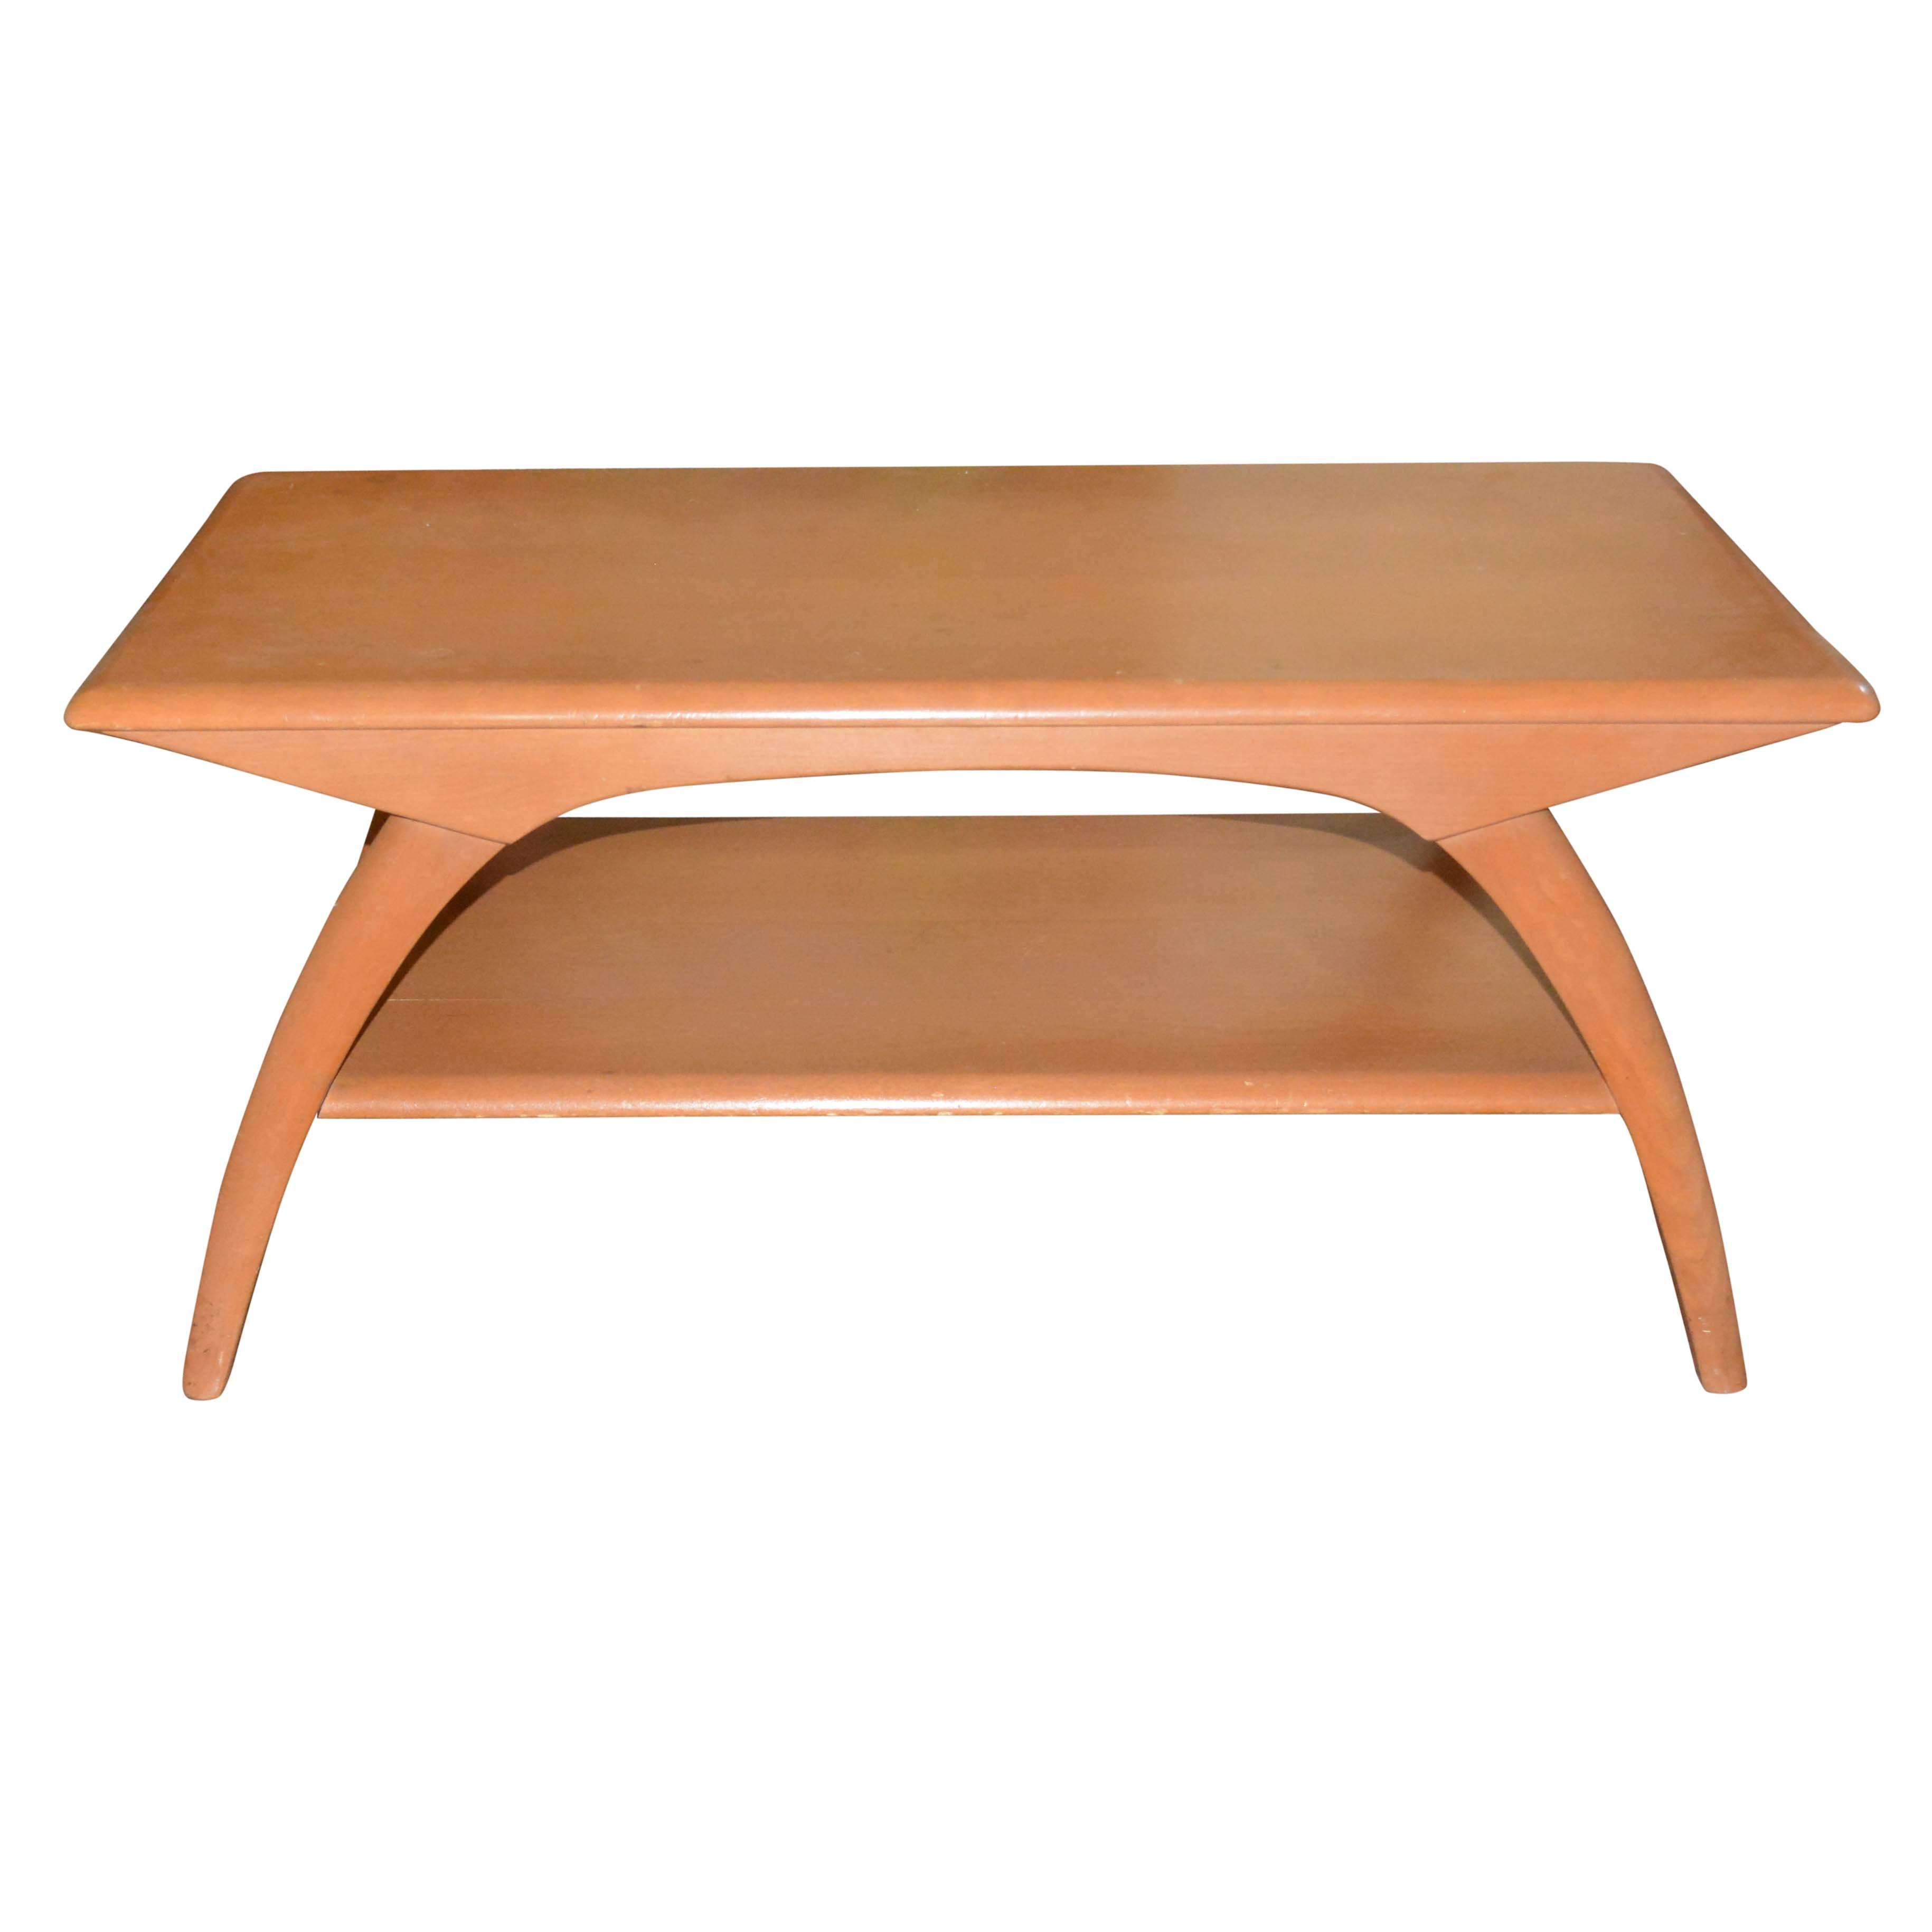 Mid Century Modern Coffee Table by Heywood-Wakefield